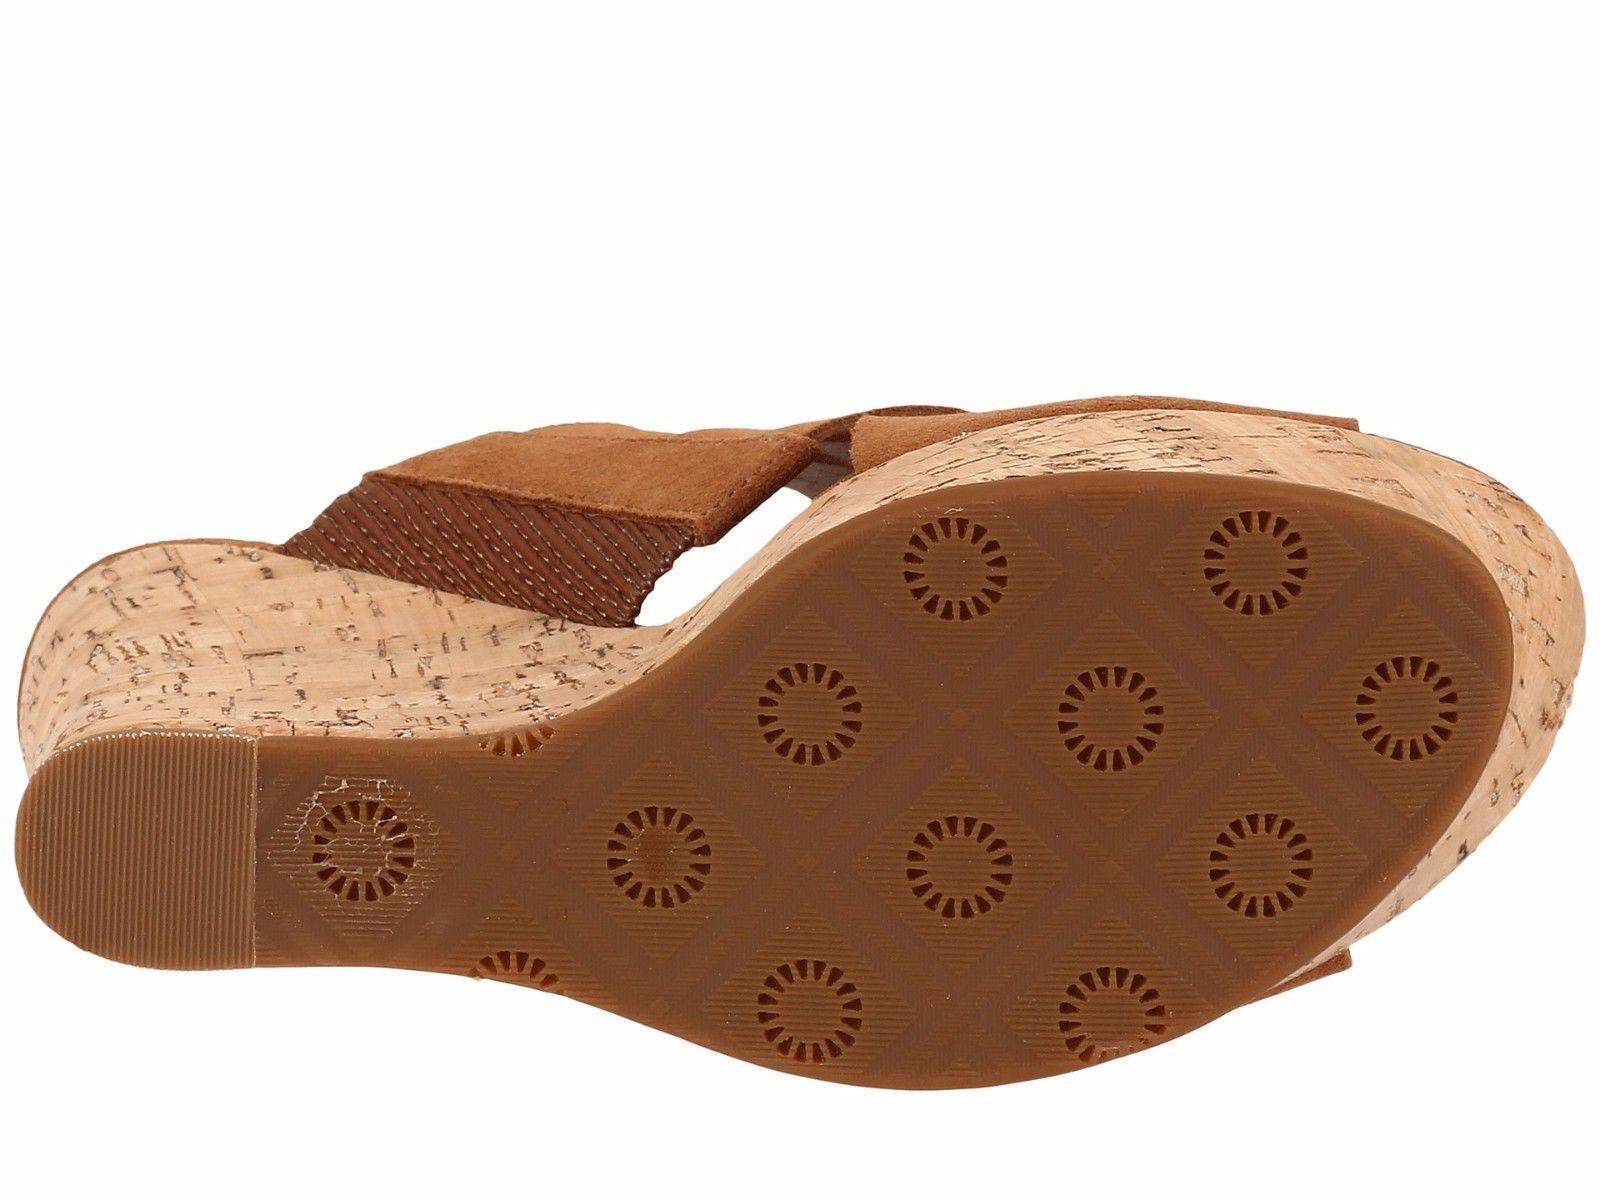 Women's UGG® Marta High Wedge Sandals, 1015079 Sizes 7-11 Chestnut Authentic